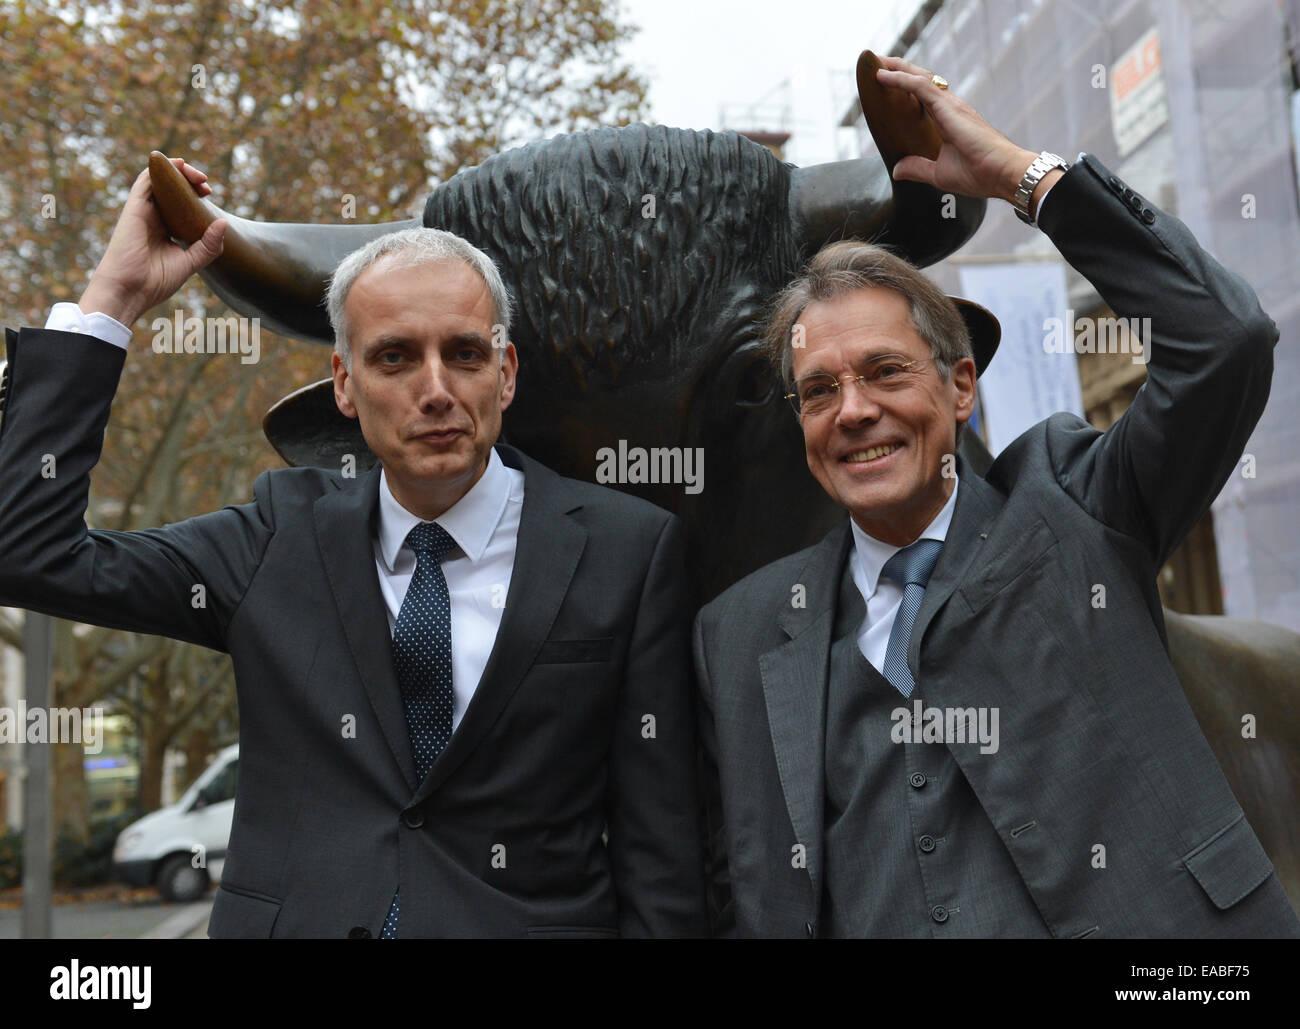 Rolf Frankfurt frankfurt germany 11th nov 2014 juergen behrend r stock